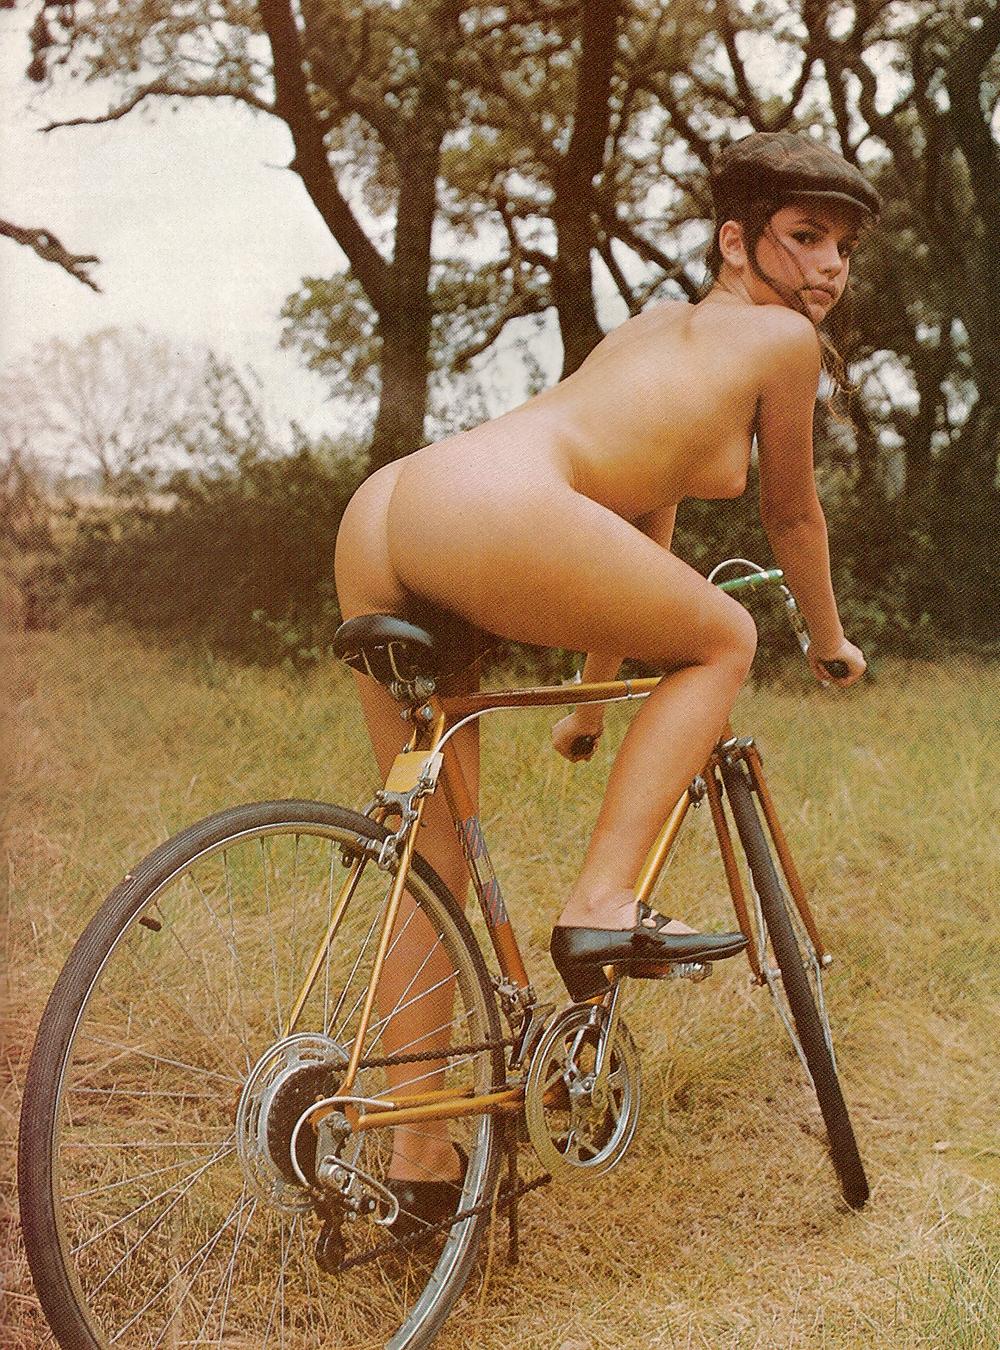 birmingham-shop-nudes-on-minibikes-porn-stars